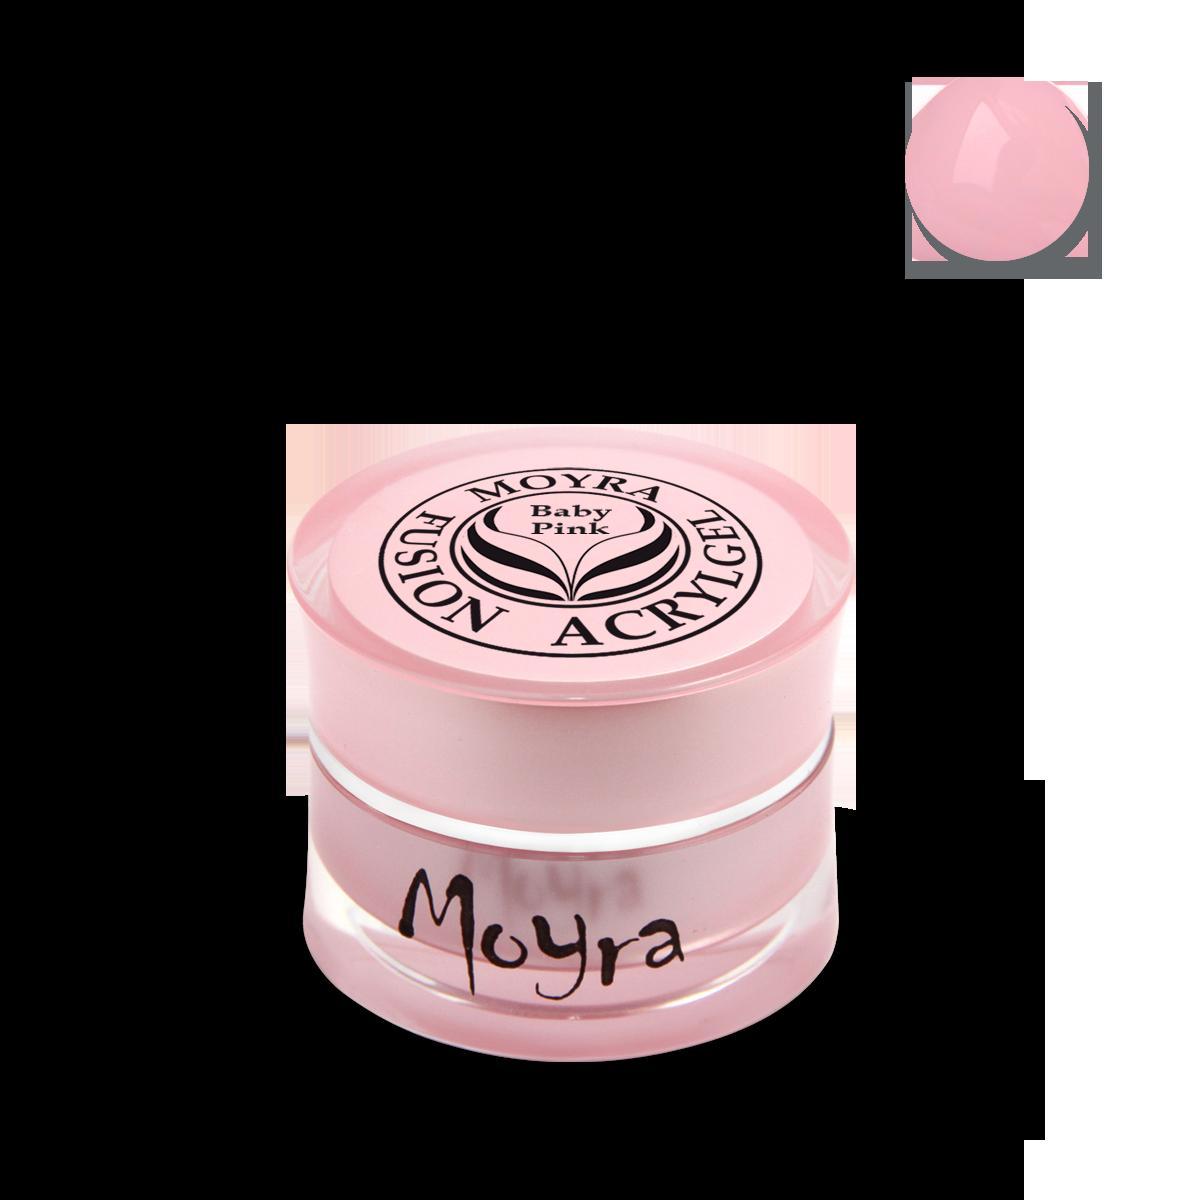 Fusion Acrylgel 5 g, Baby Pink